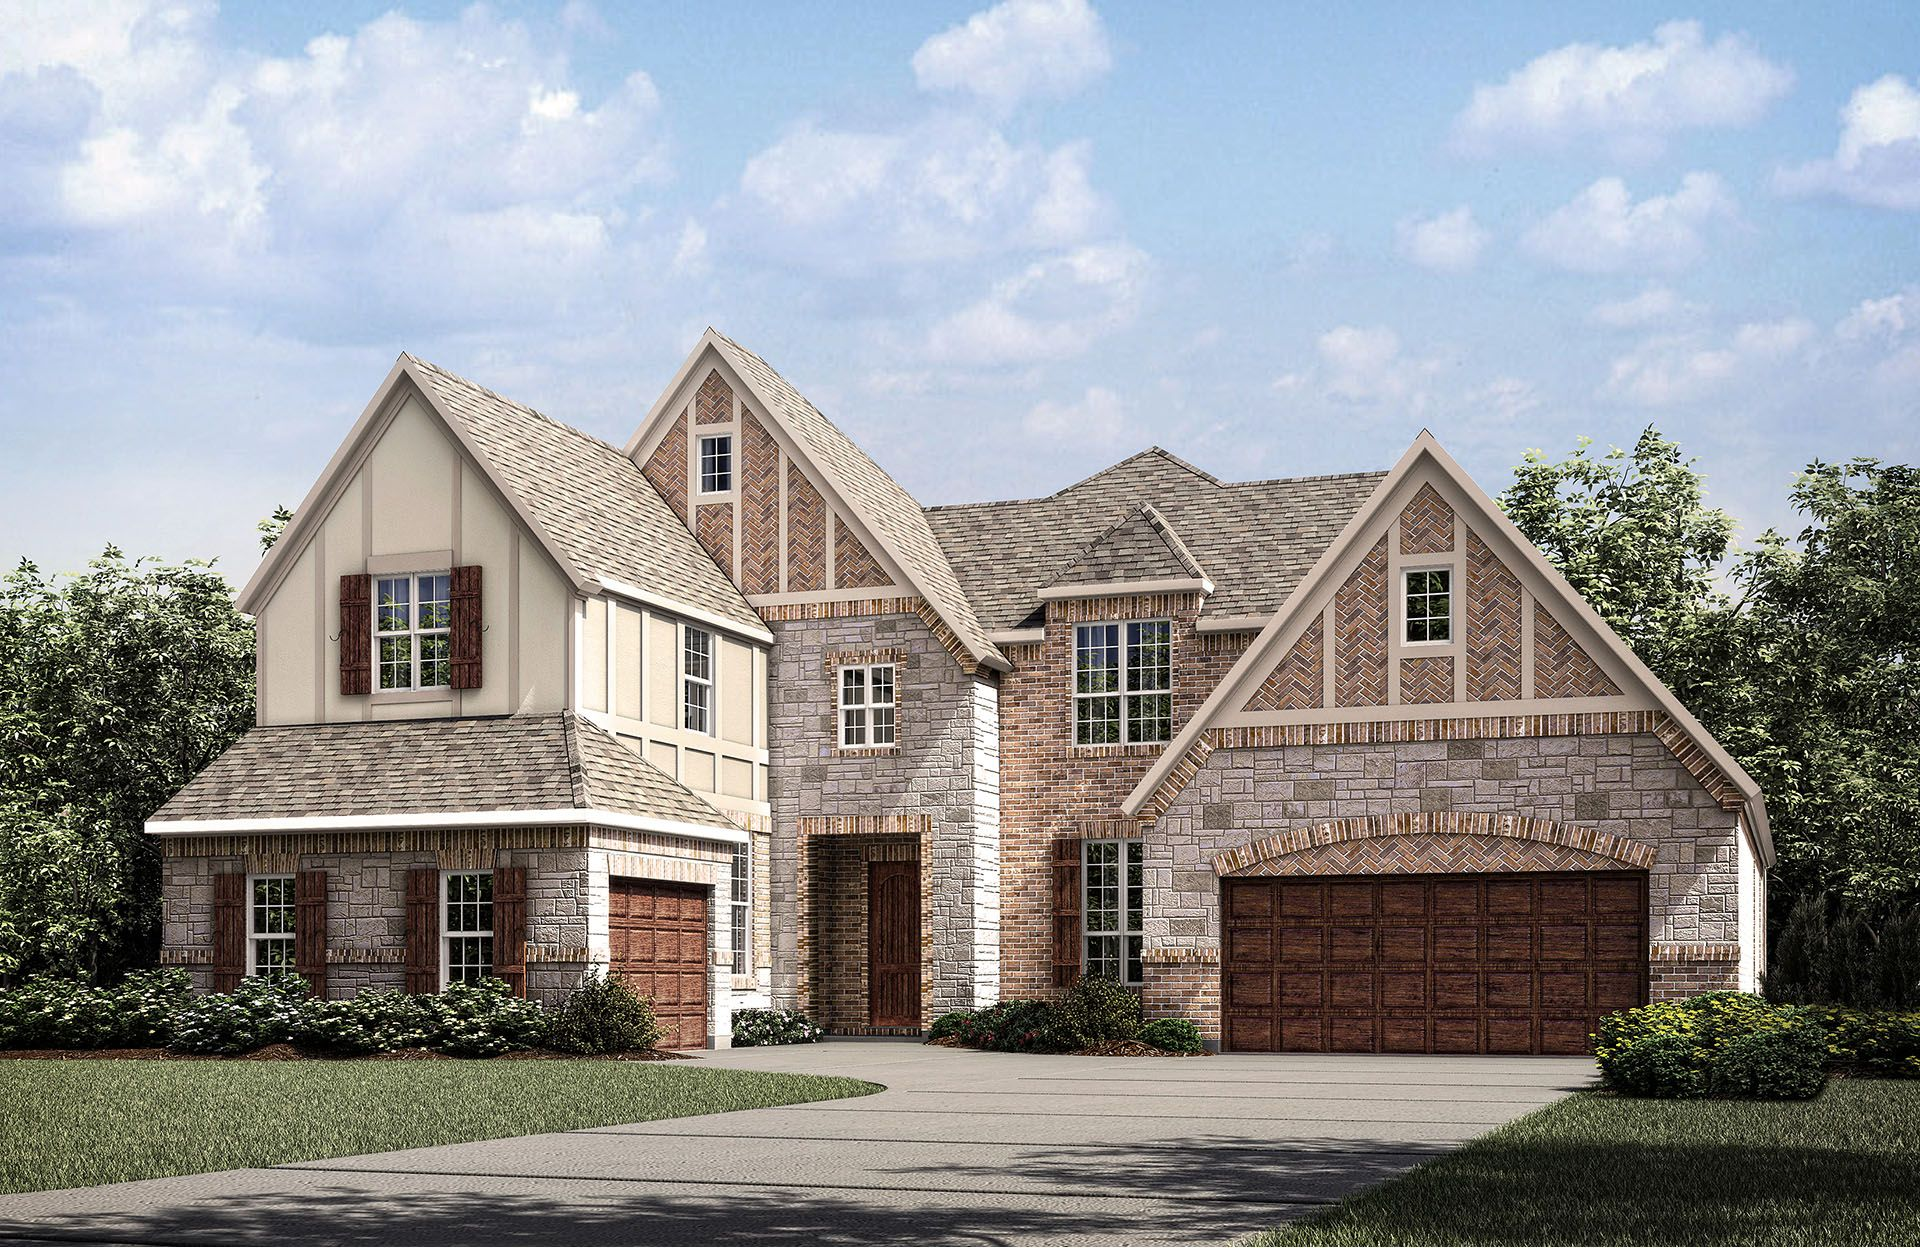 Single Family for Active at Royal Brook At Kingwood - Antonio 3306 Lockridge Harbor Lane Porter, Texas 77365 United States